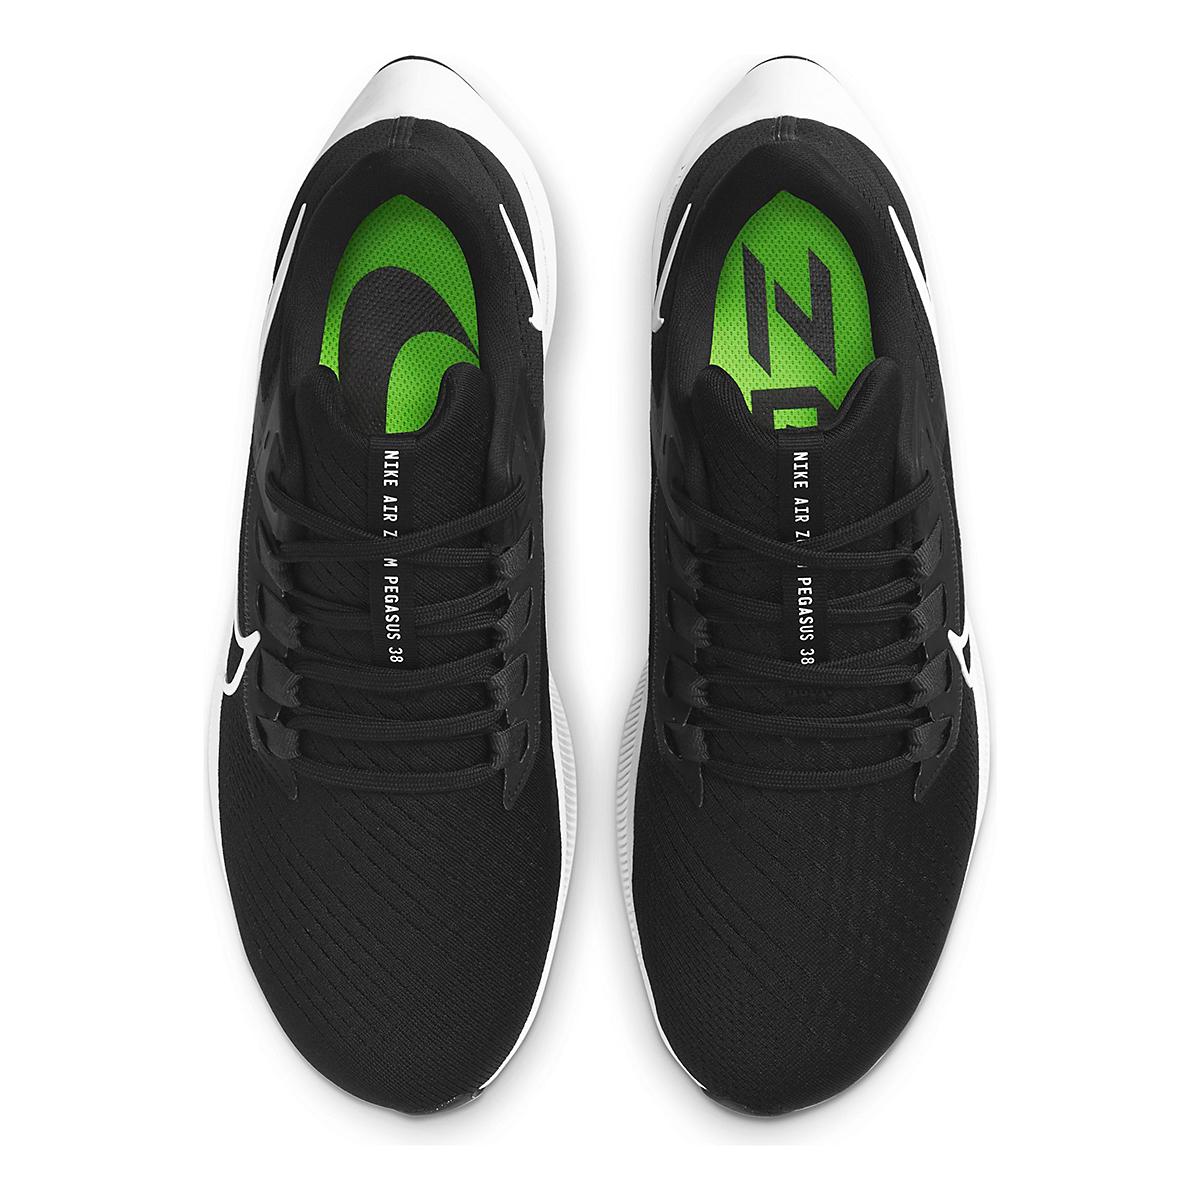 Men's Nike Air Zoom Pegasus 38 Running Shoe - Color: Black/White/Anthracite - Size: 6 - Width: Regular, Black/White/Anthracite, large, image 6